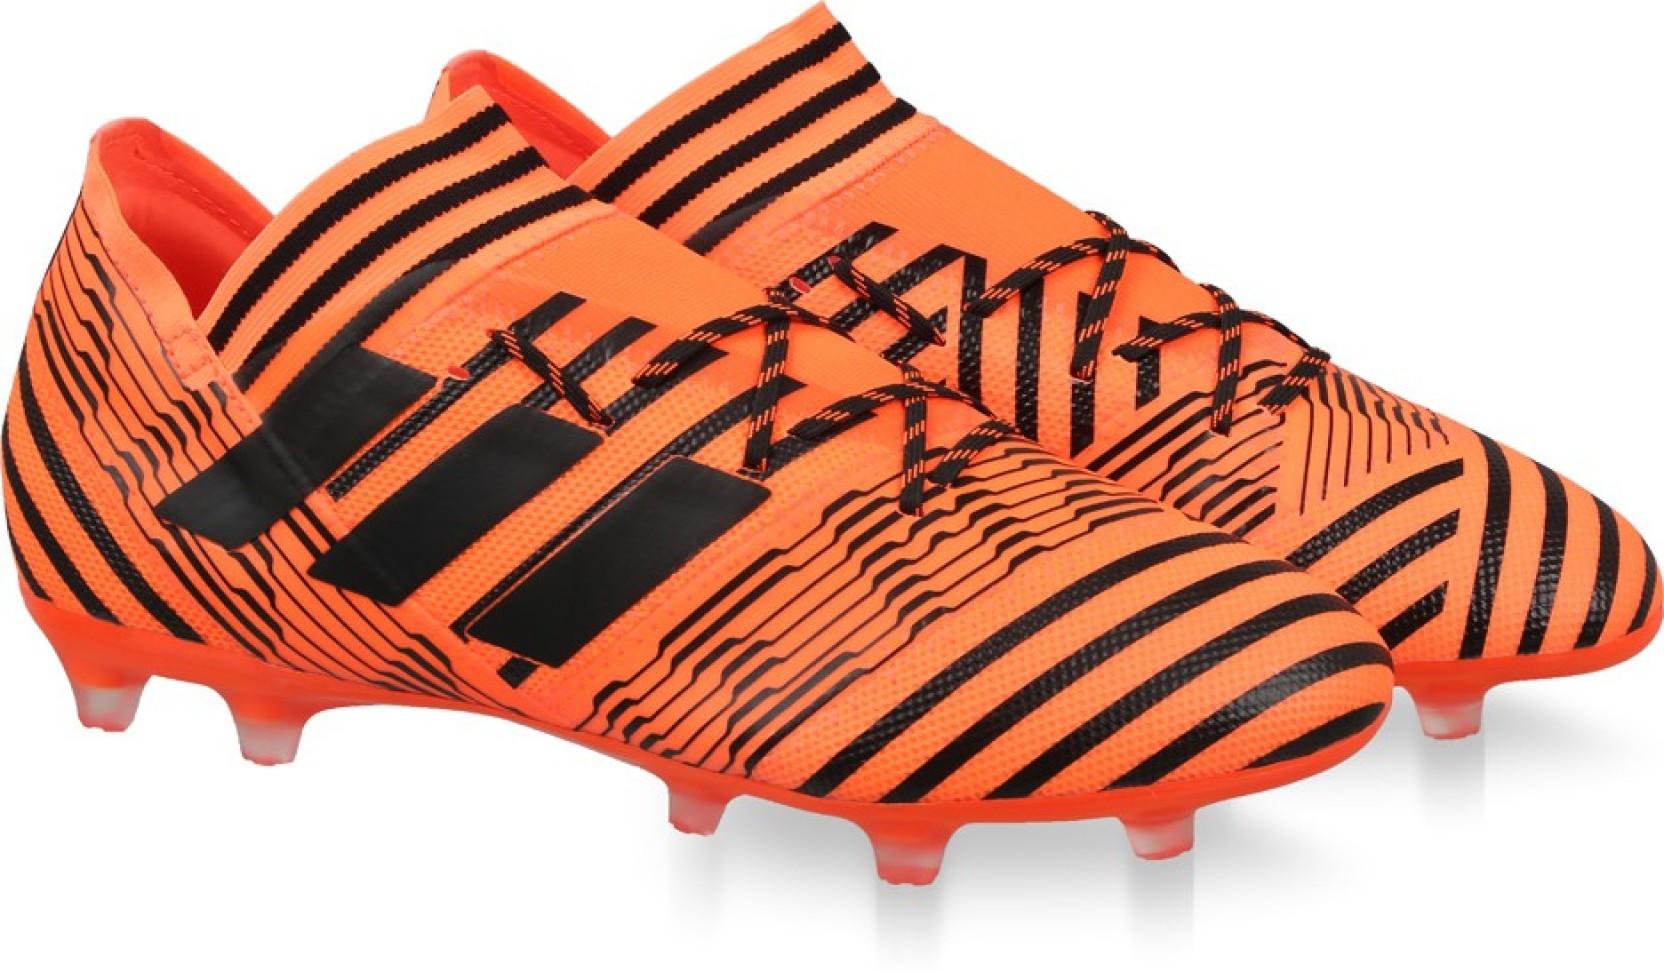 d0f4da97718 ADIDAS NEMEZIZ 17.2 FG Football Shoes For Men - Buy SORANG CBLACK ...